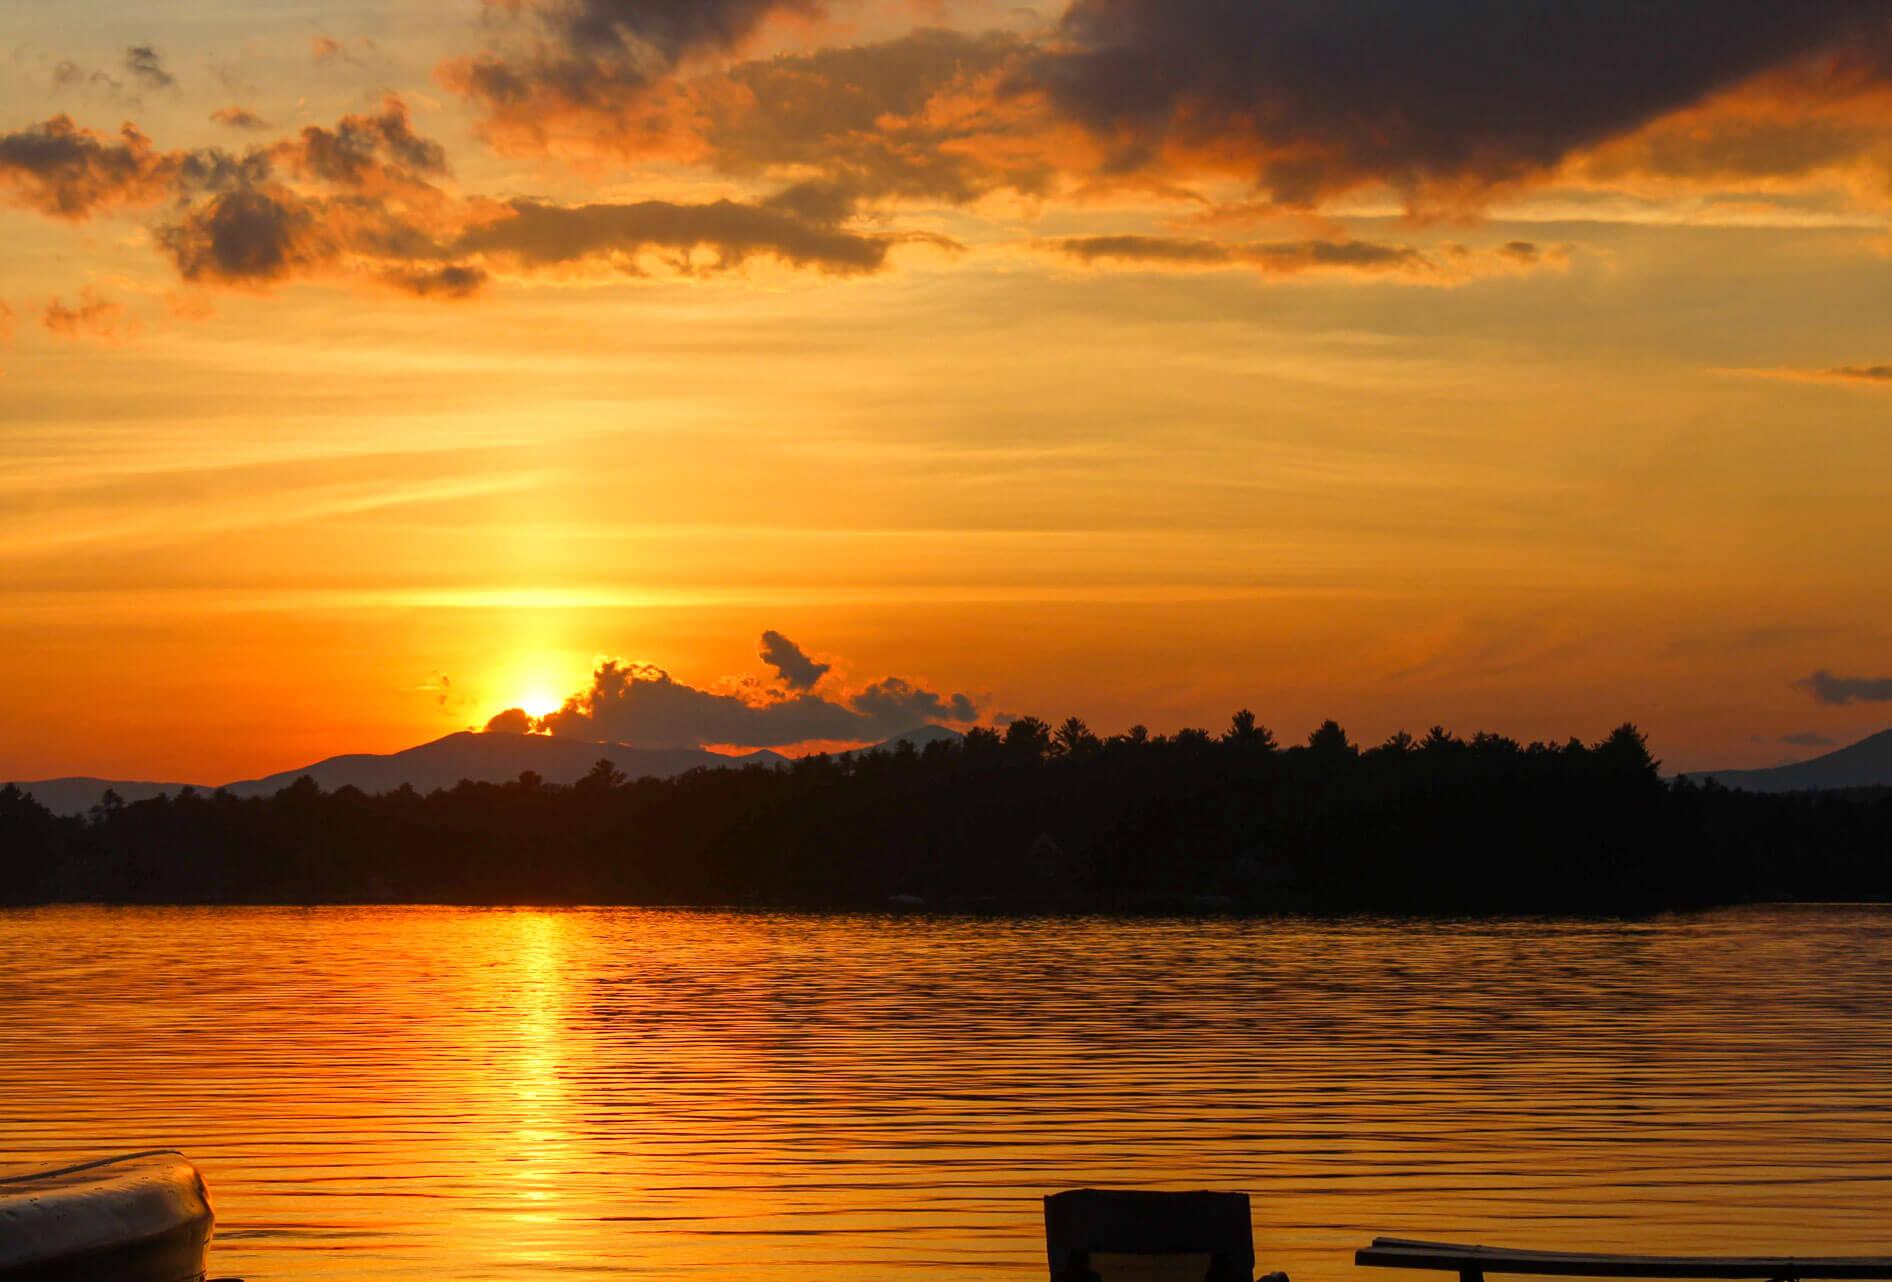 Sunset over camp lake